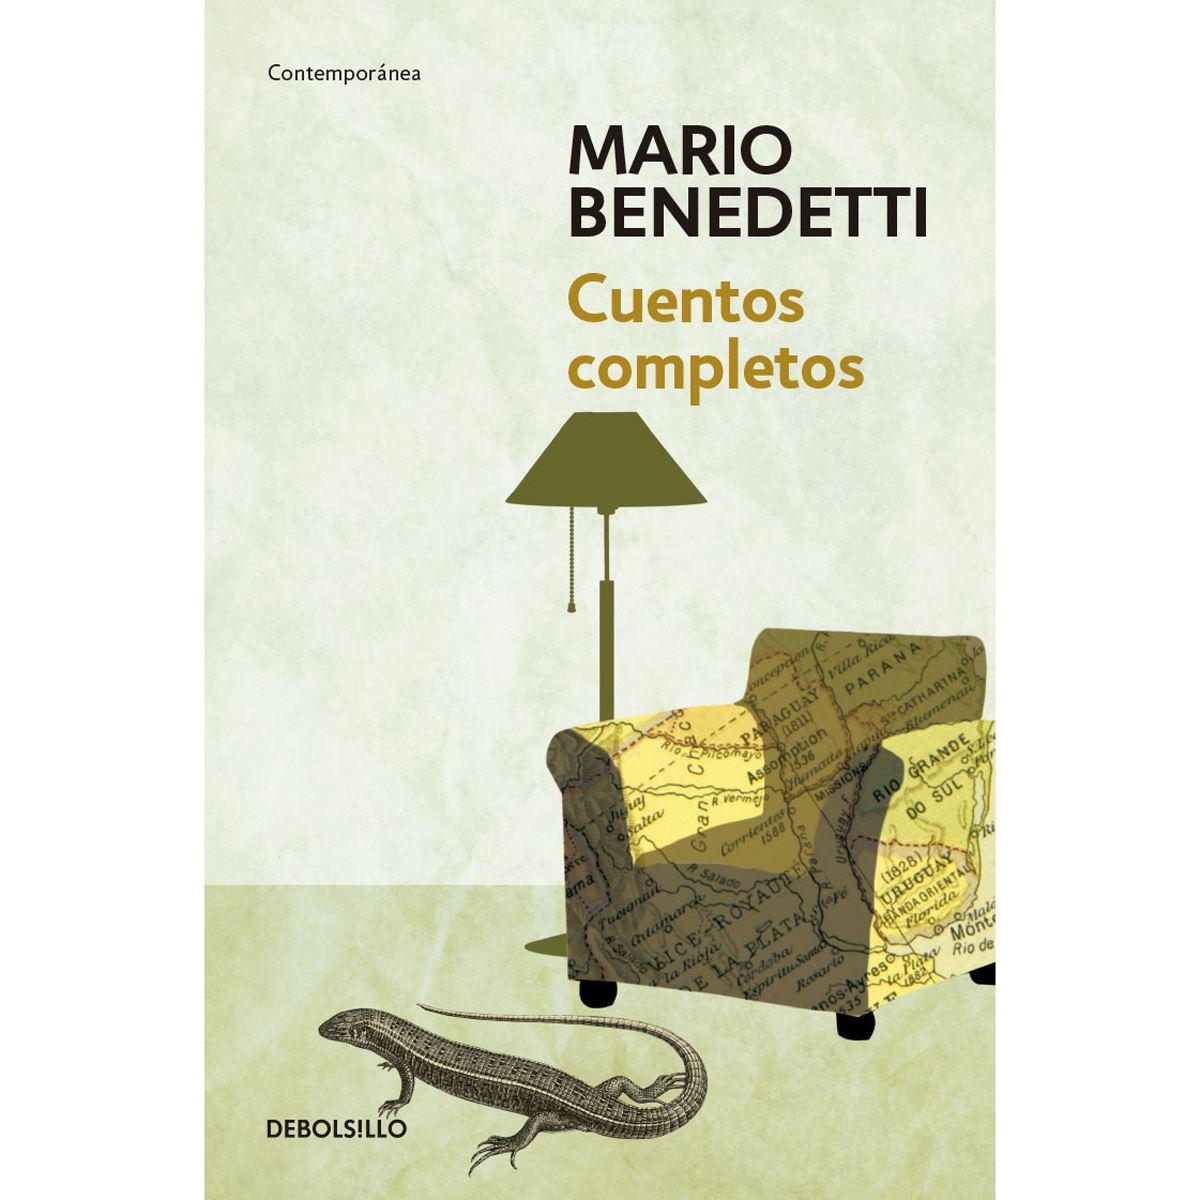 Cuentos completos Benedetti